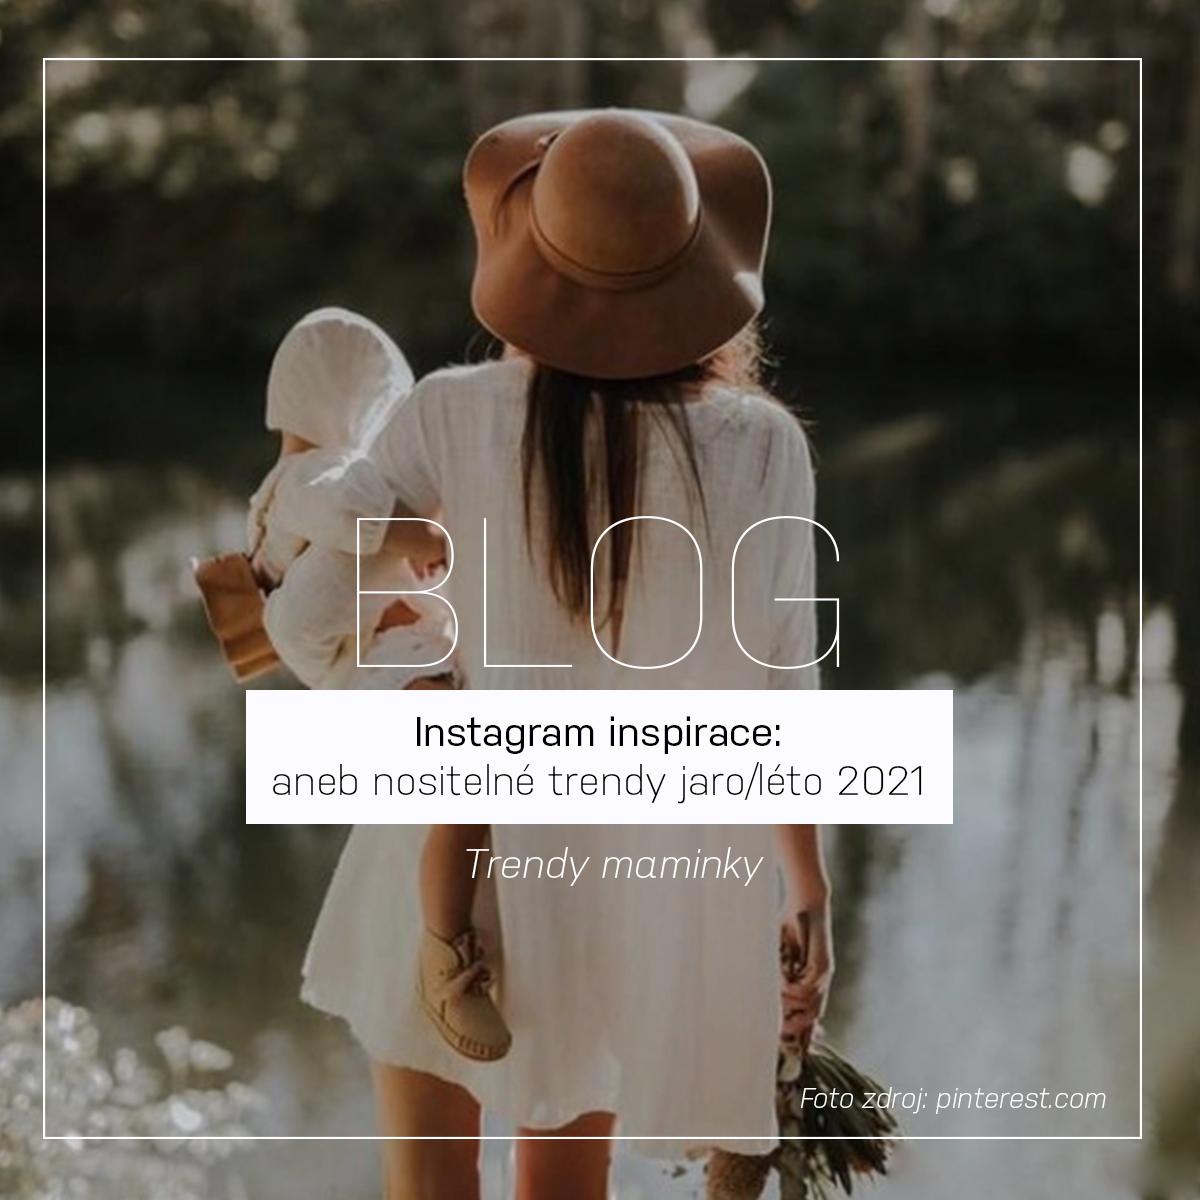 Instagram inspirace: Trendy maminky aneb nositelné trendy jaro/léto 2021